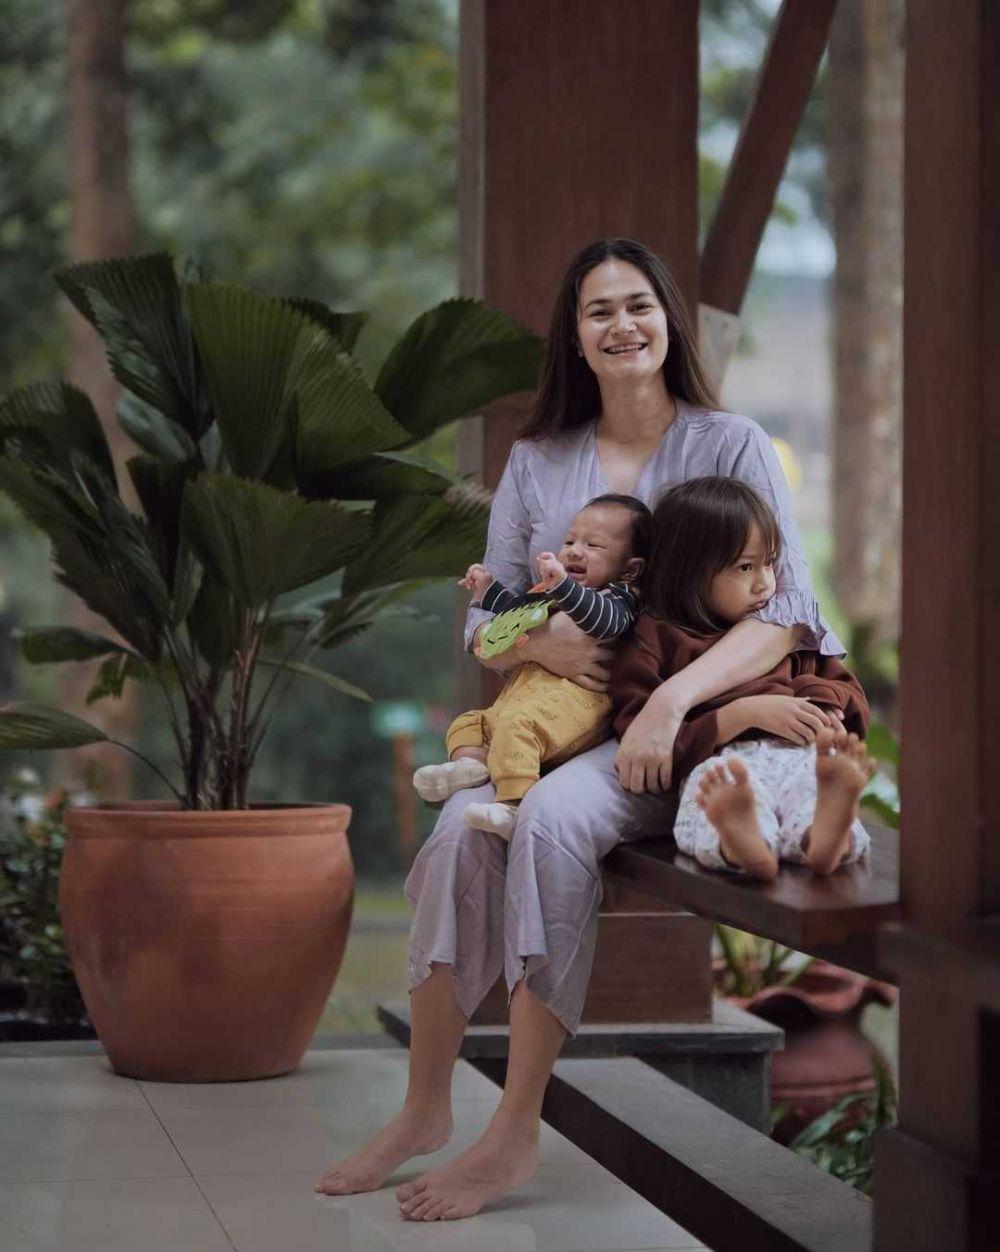 10 Potret Kompak Kedua Anak Ringgo Agus dan Sabai, Akur Saling Sayang!